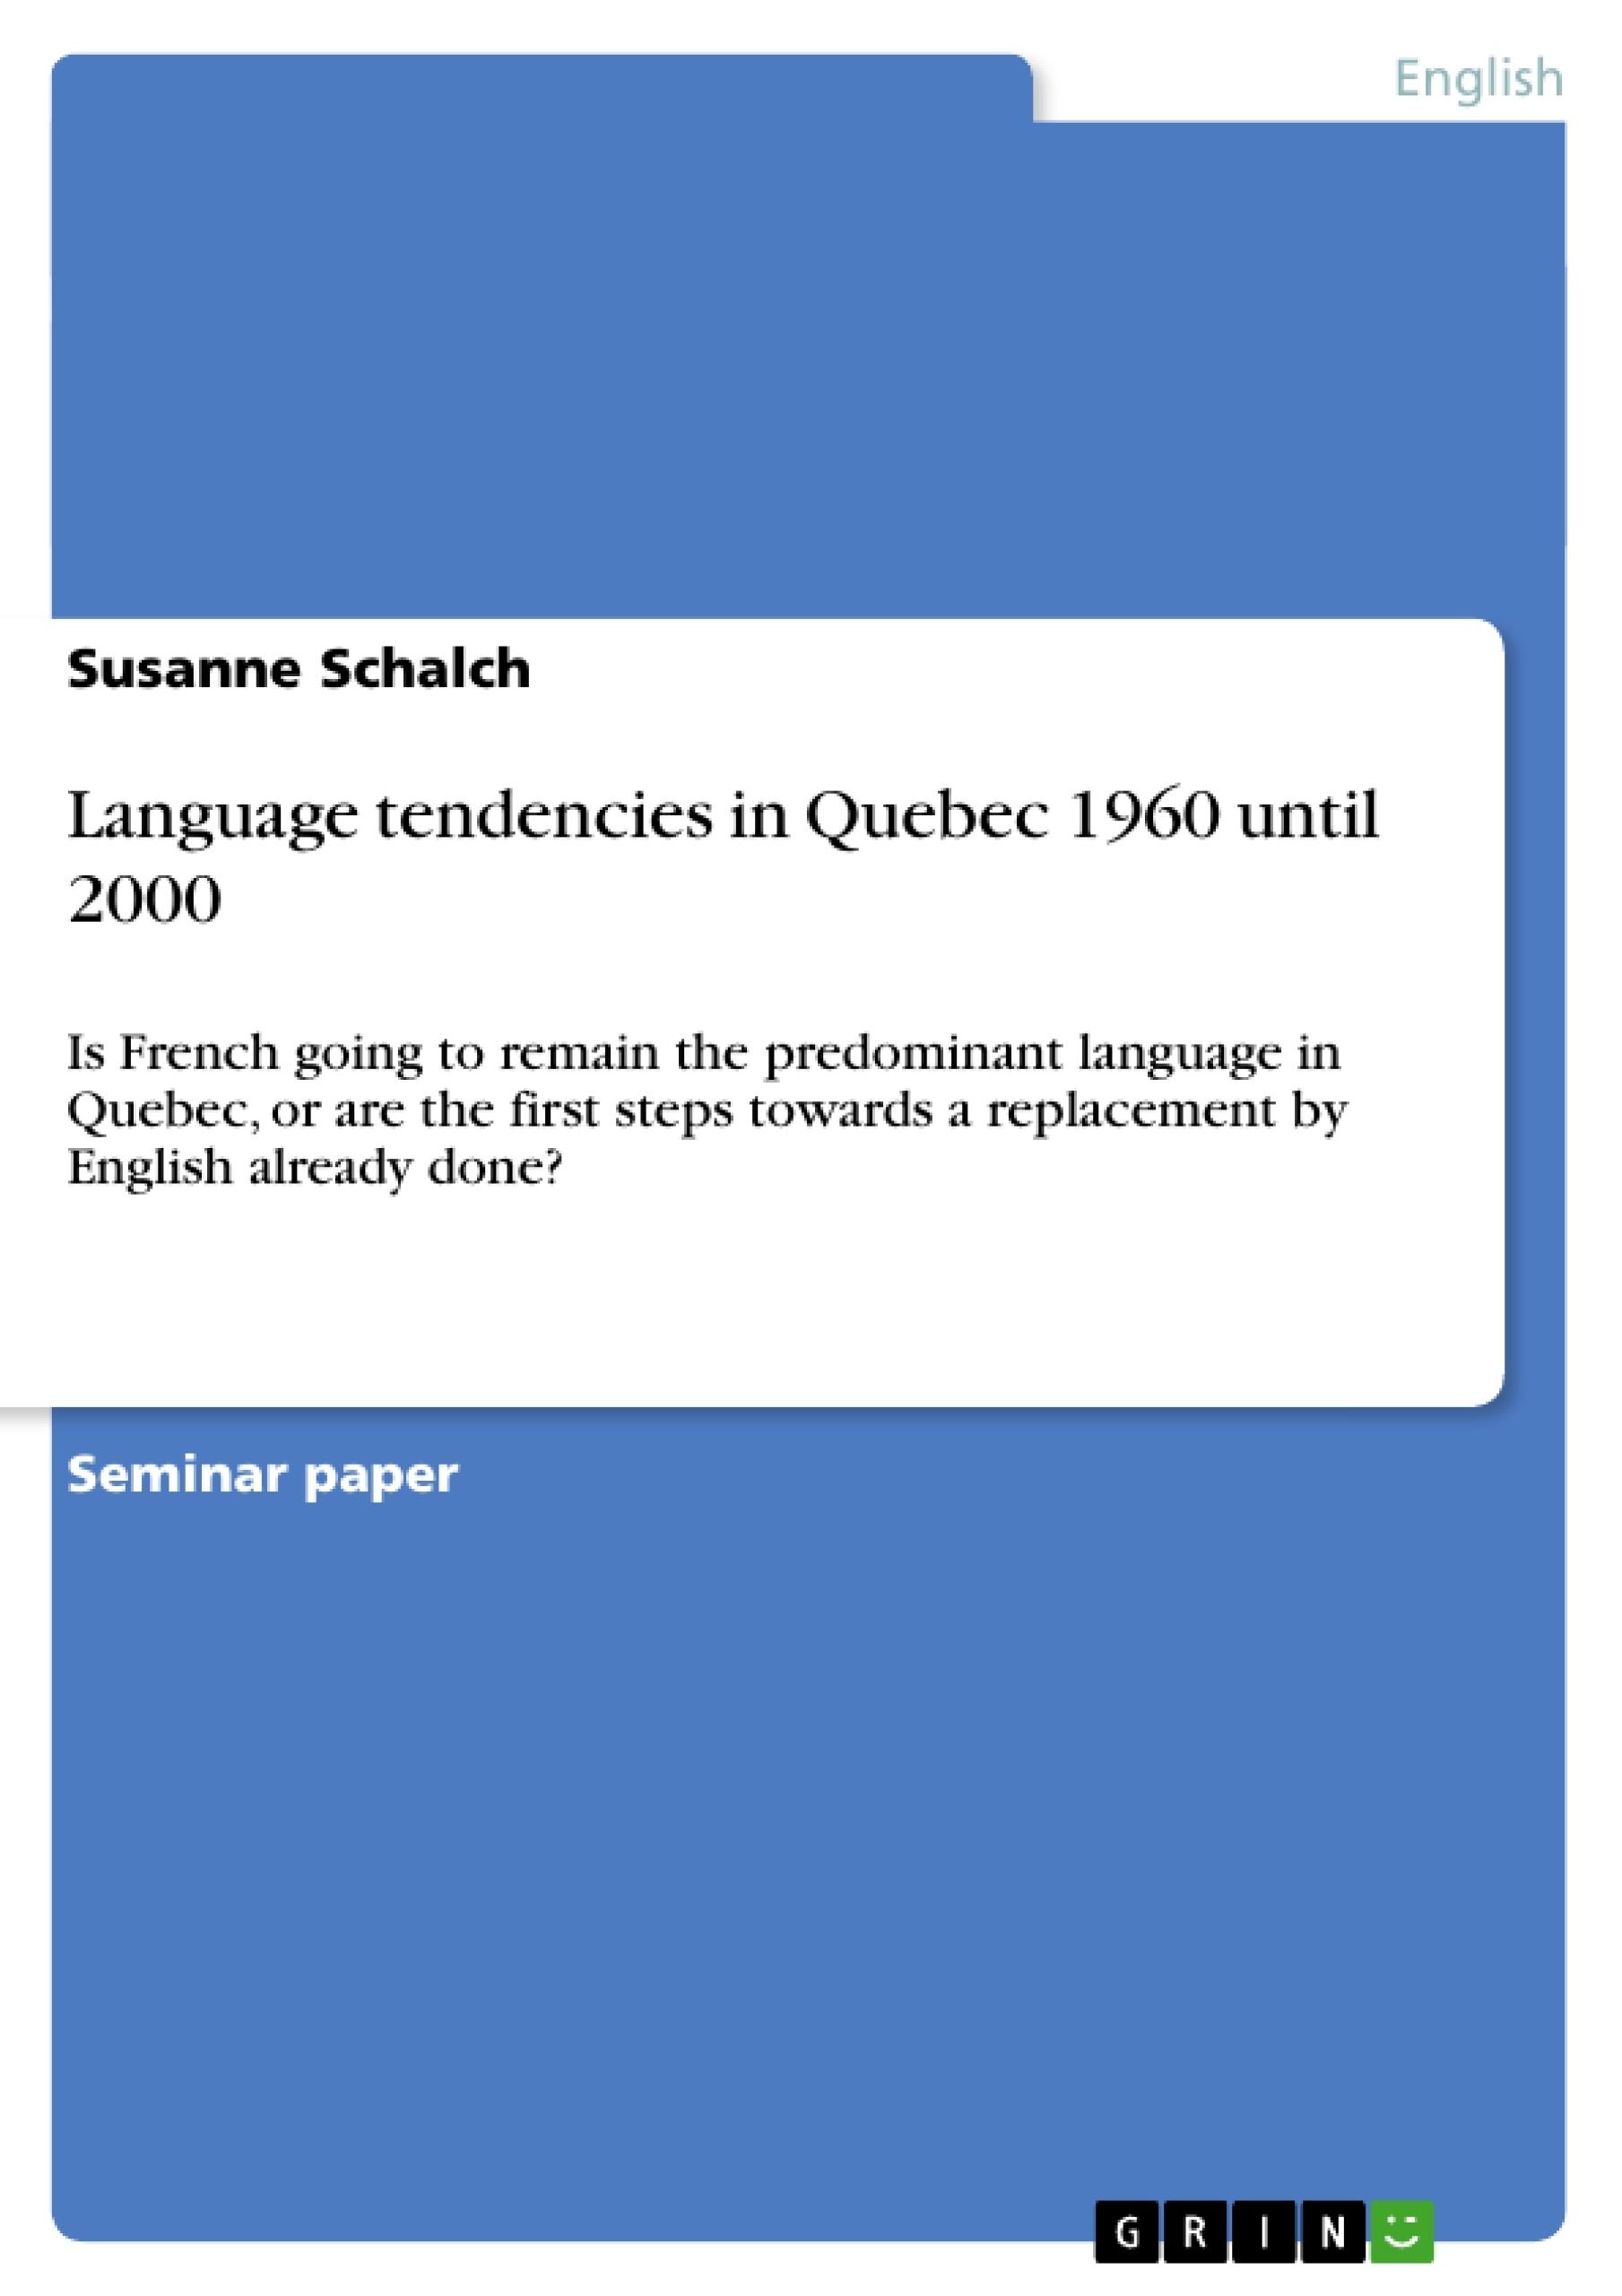 Title: Language tendencies in Quebec 1960 until 2000